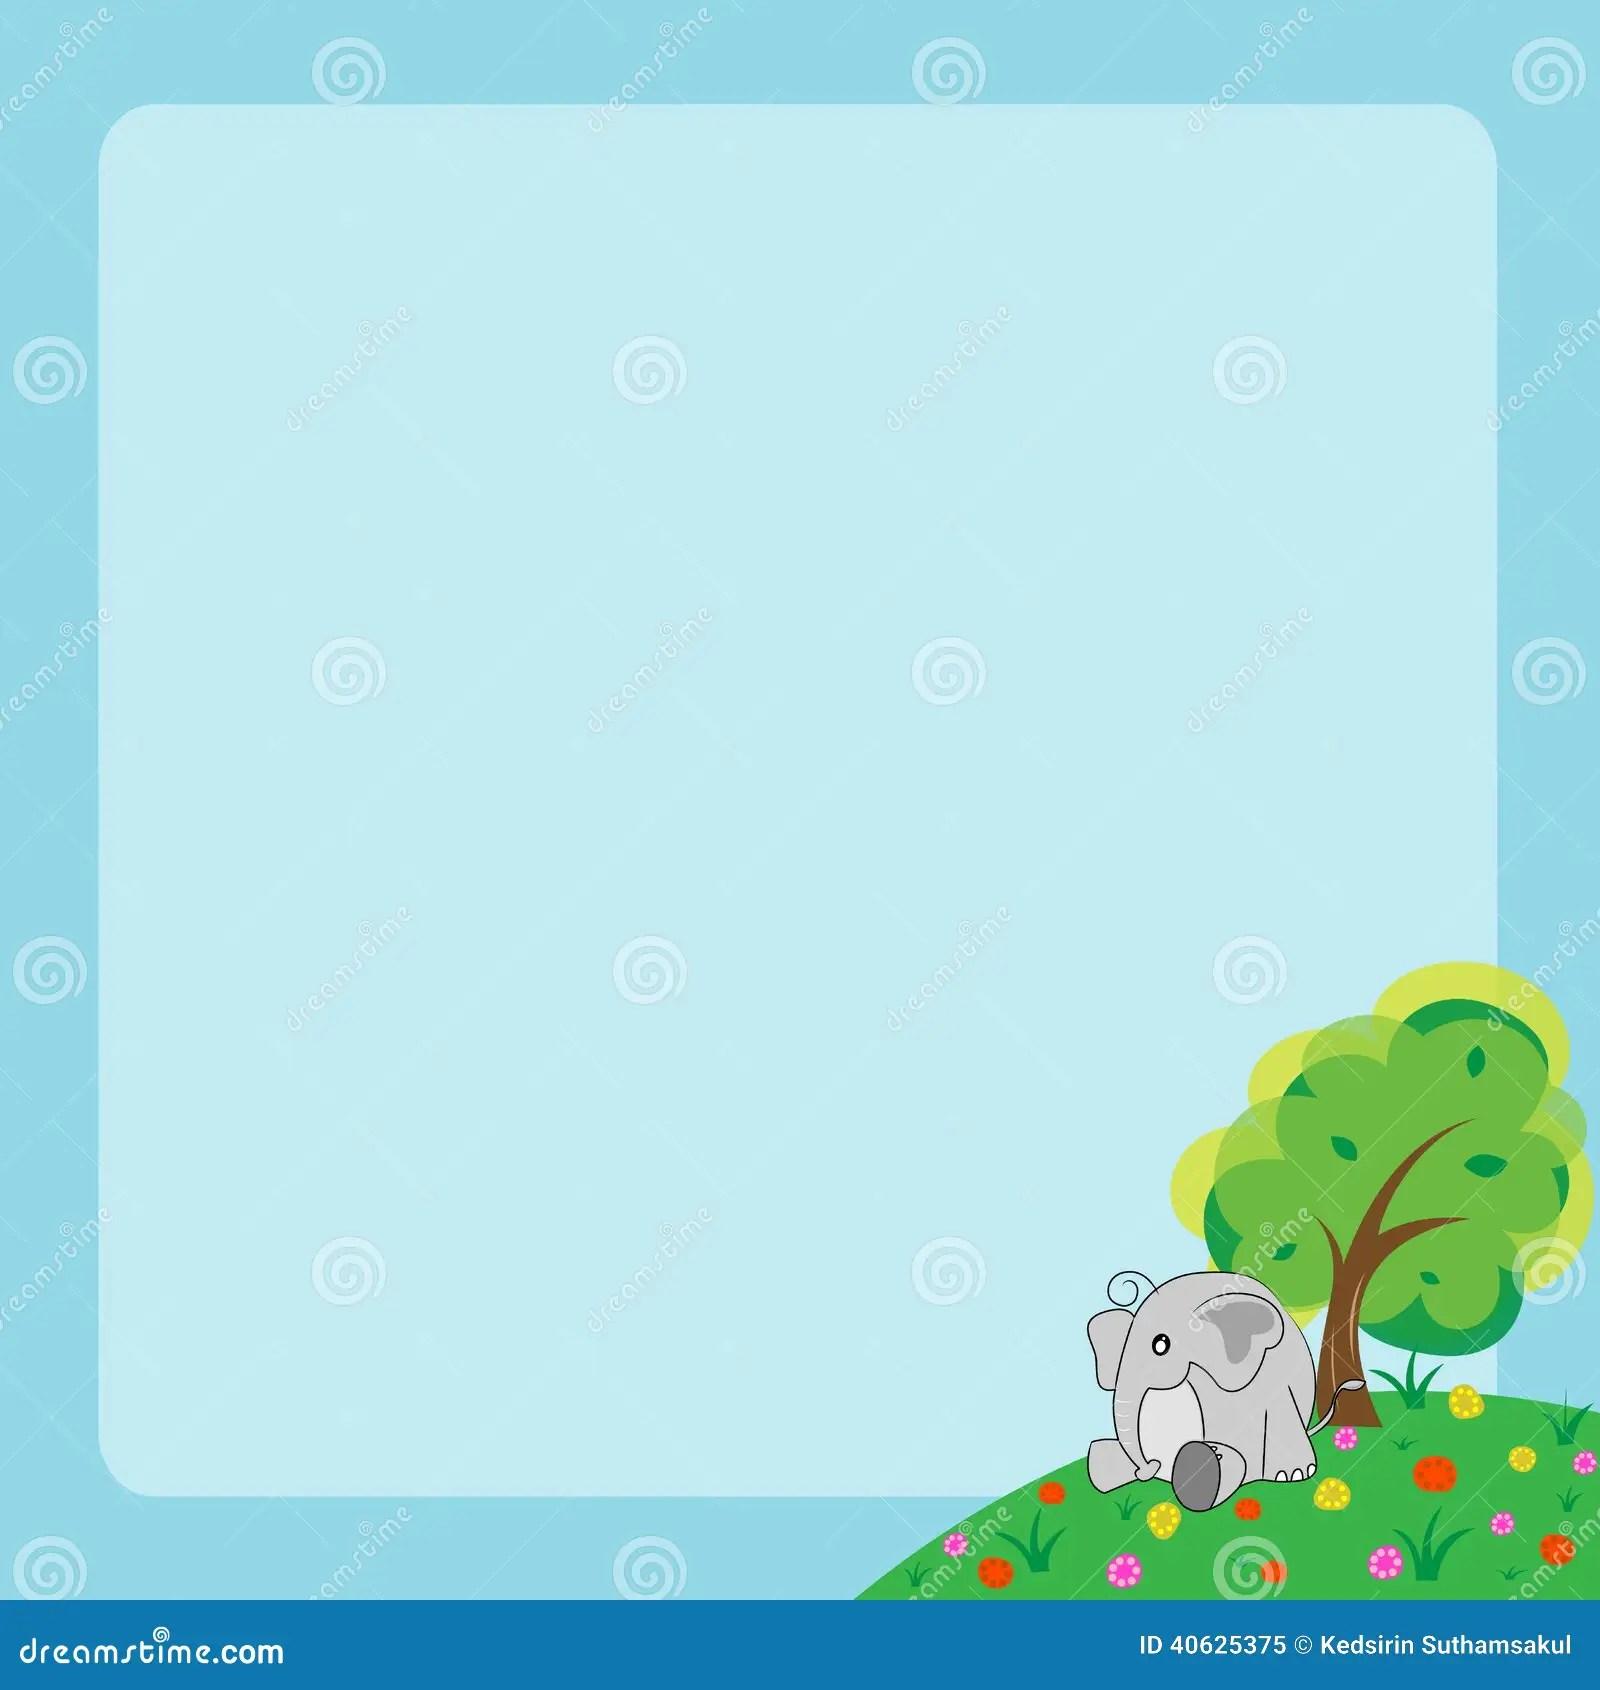 Cute Elephant Design Wallpaper Cartoon Animal Frame Stock Vector Illustration Of